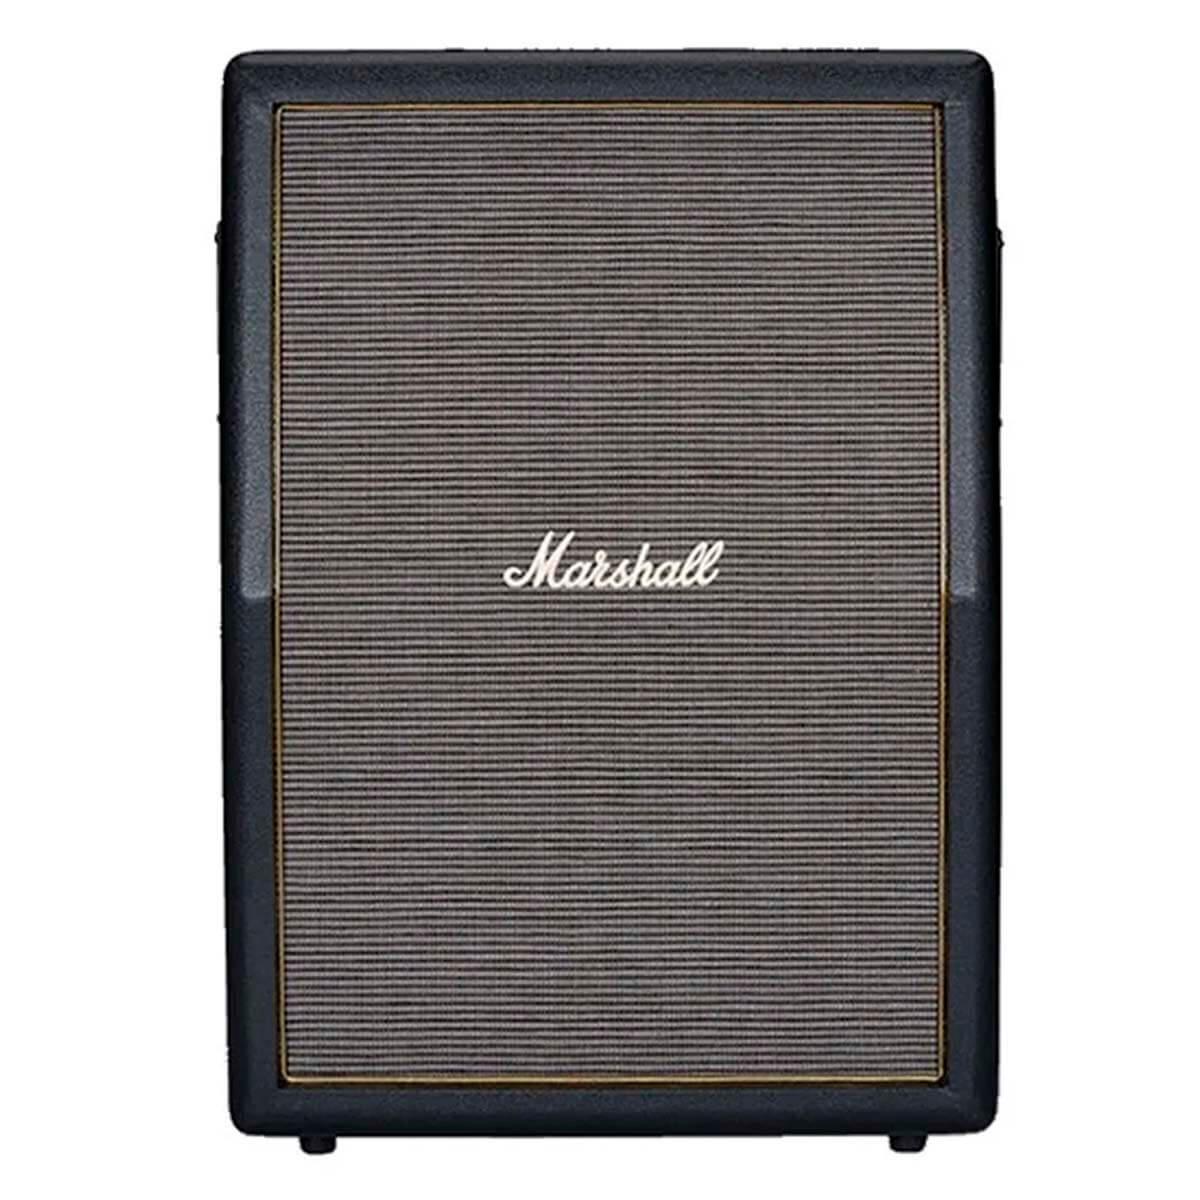 Gabinete Marshall ORI212A 160W 2x12 para Guitarra